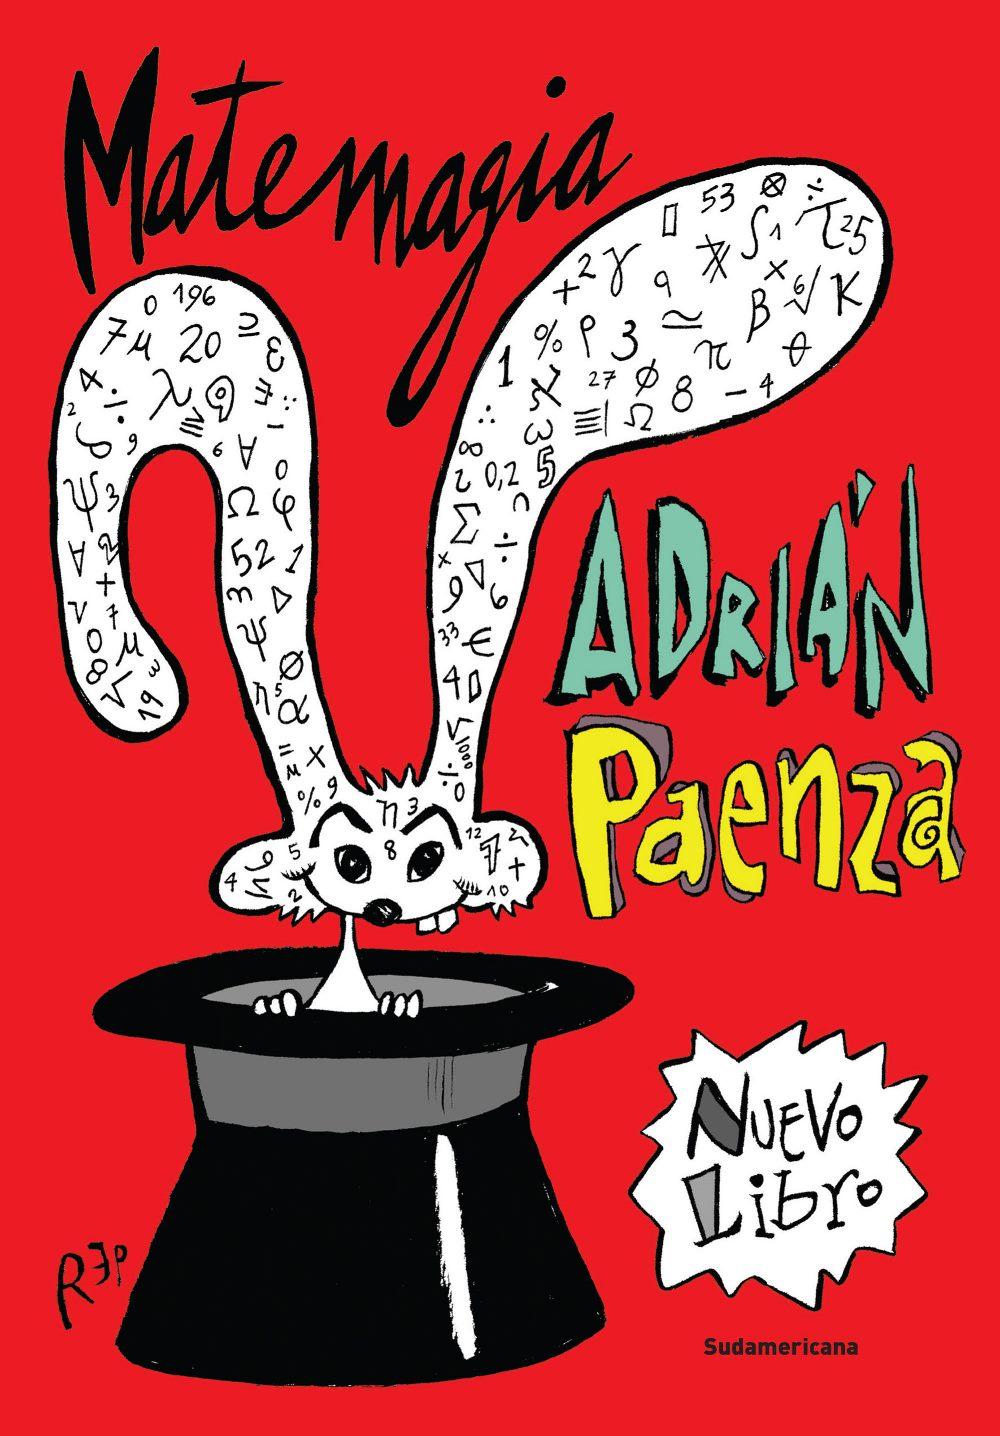 Matemagia – Adrián Paenza